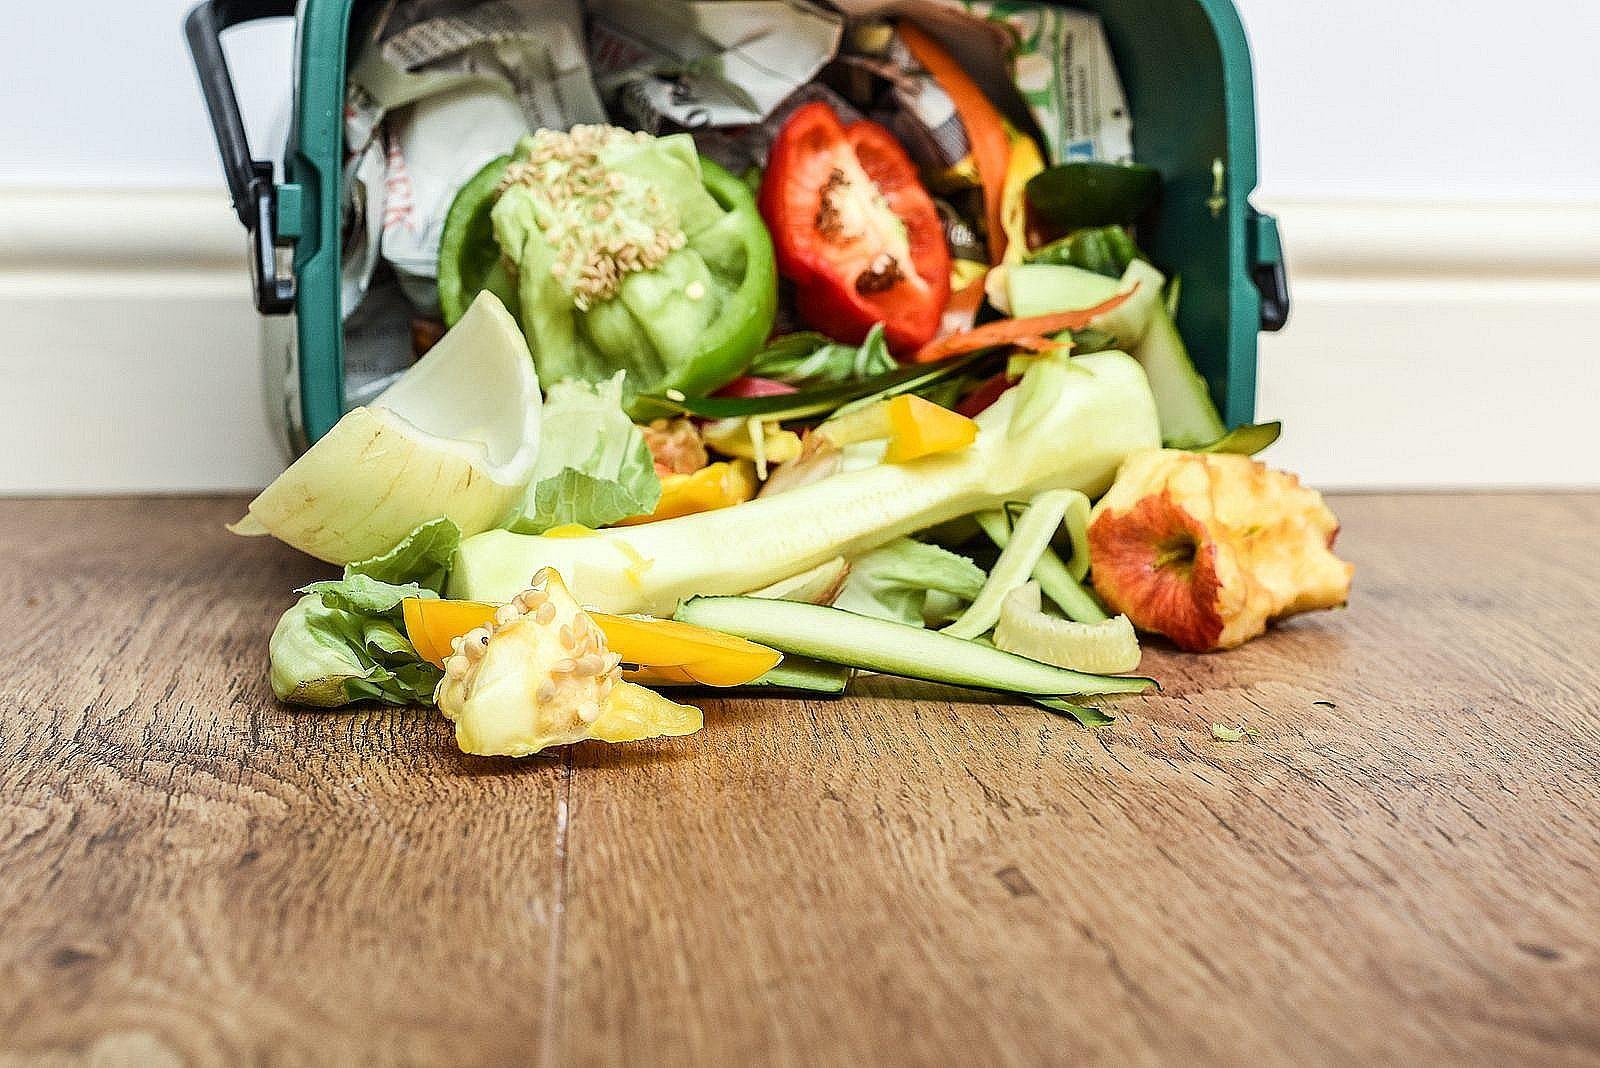 Food waste spilling out of basket in kitchen